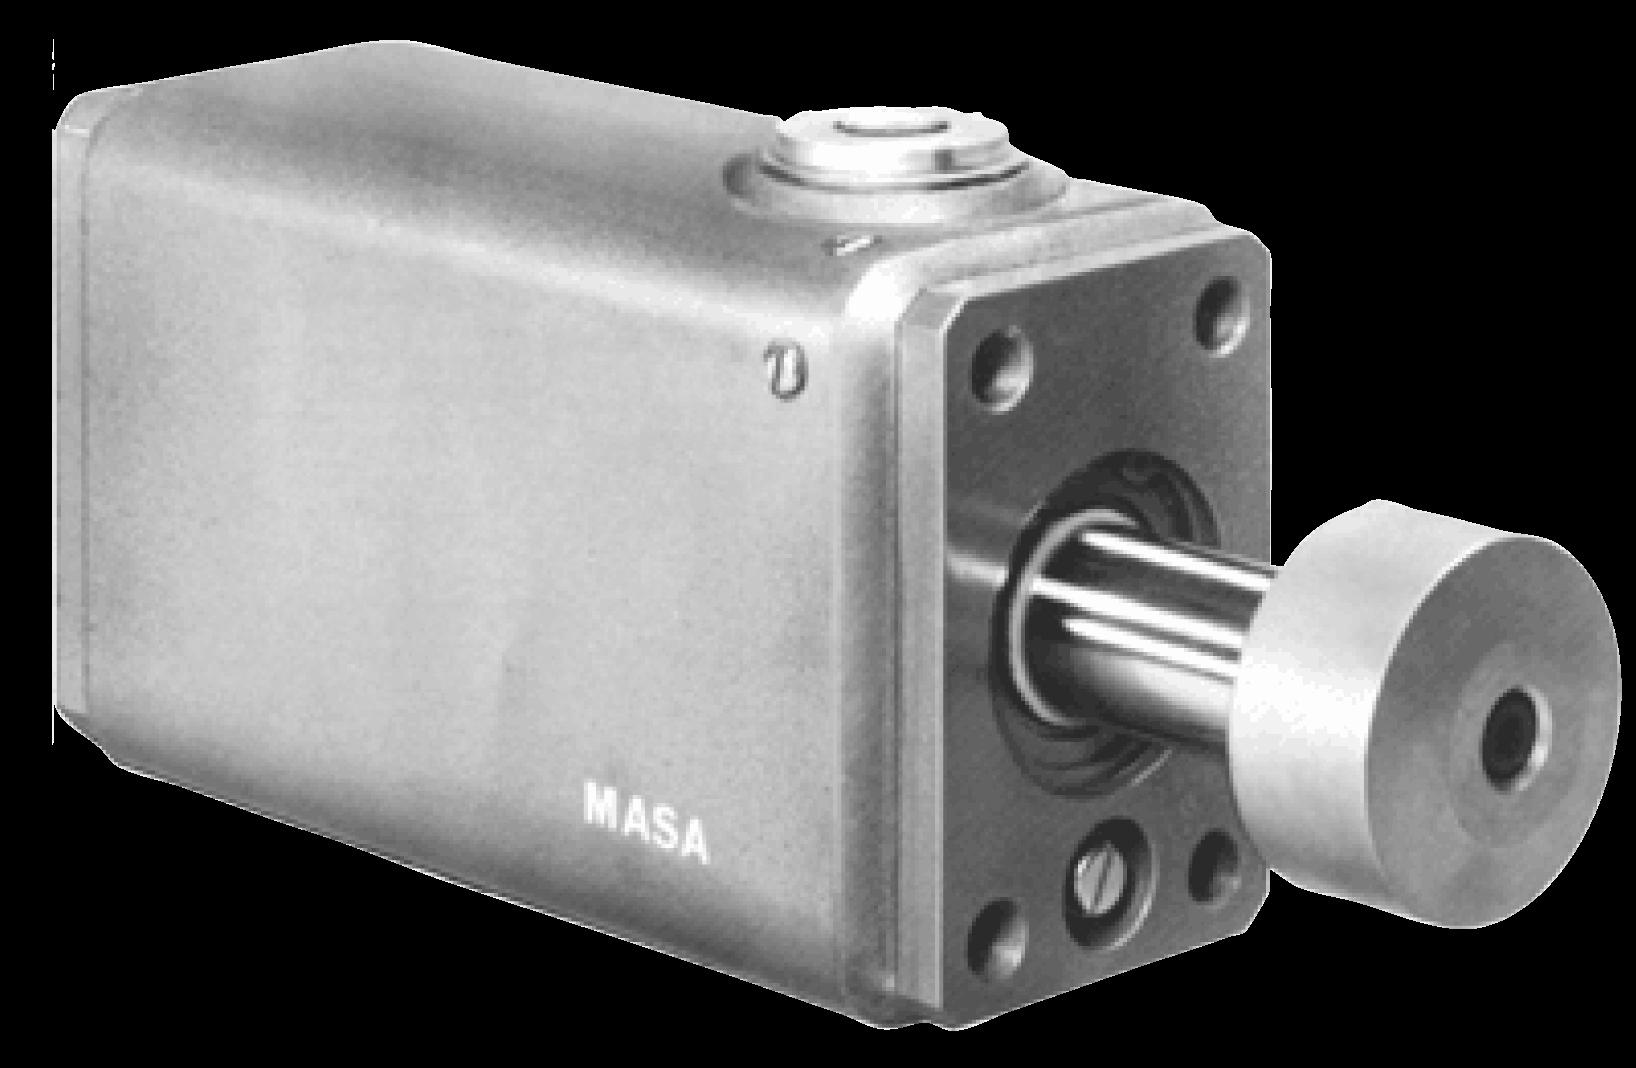 efdyn减震器MASA.1.125 X4 SS 04 30 98 Seris:31554